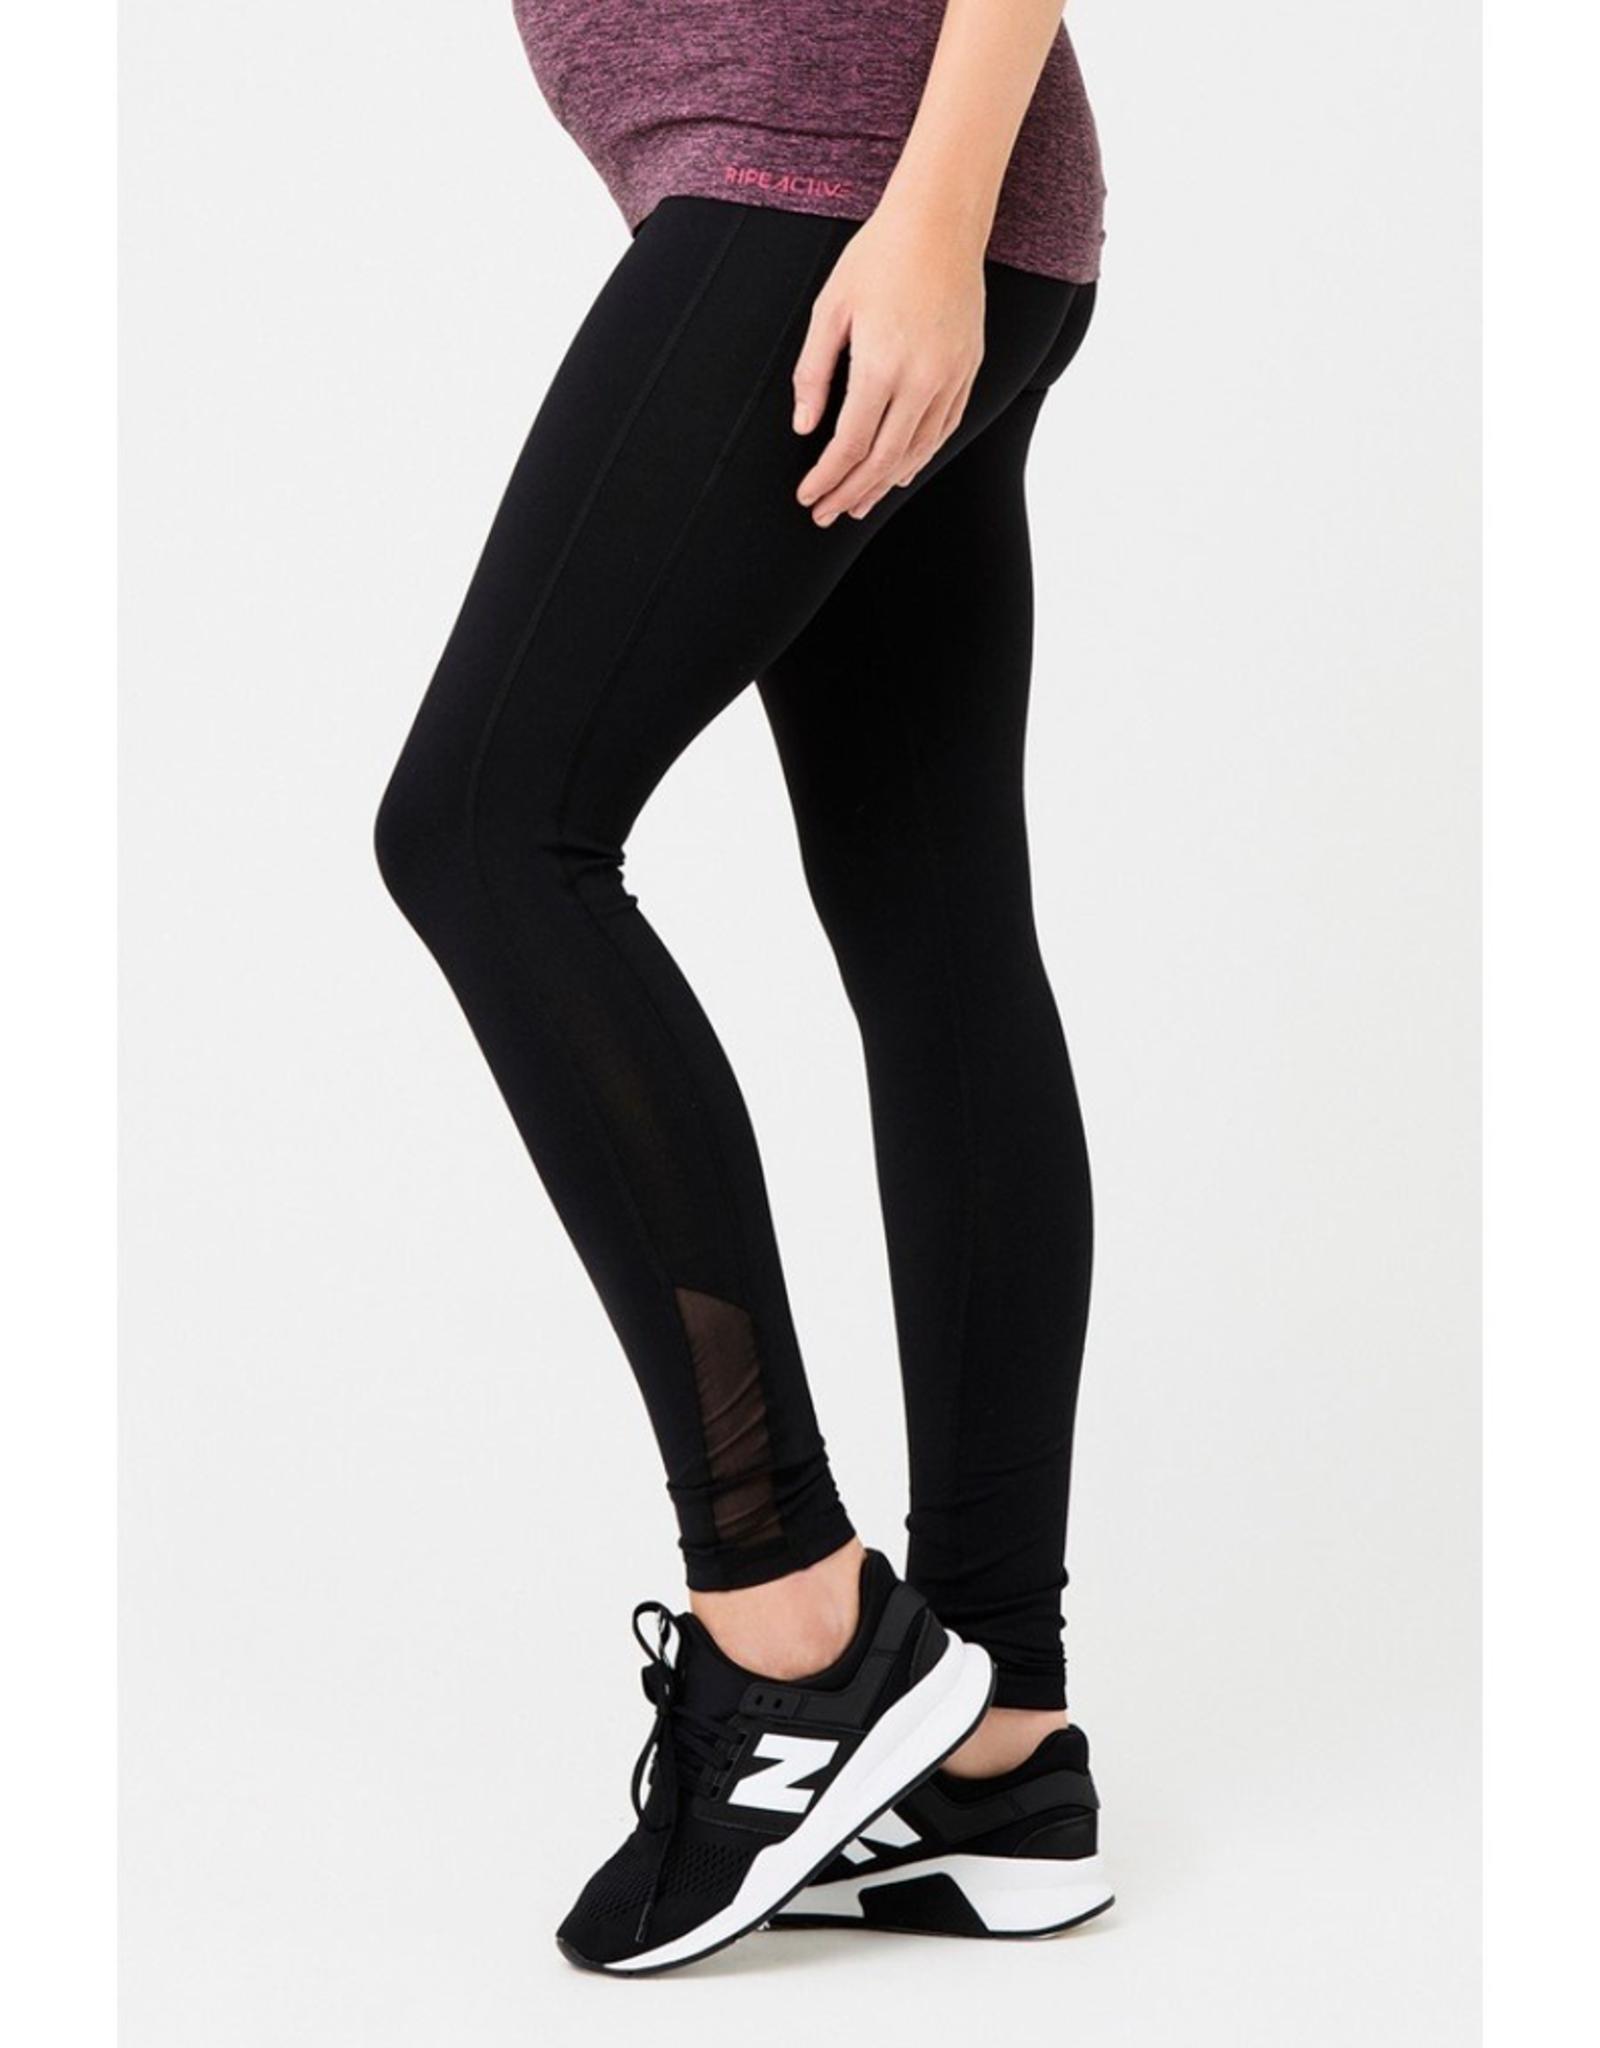 Ripe Maternity Balance Legging